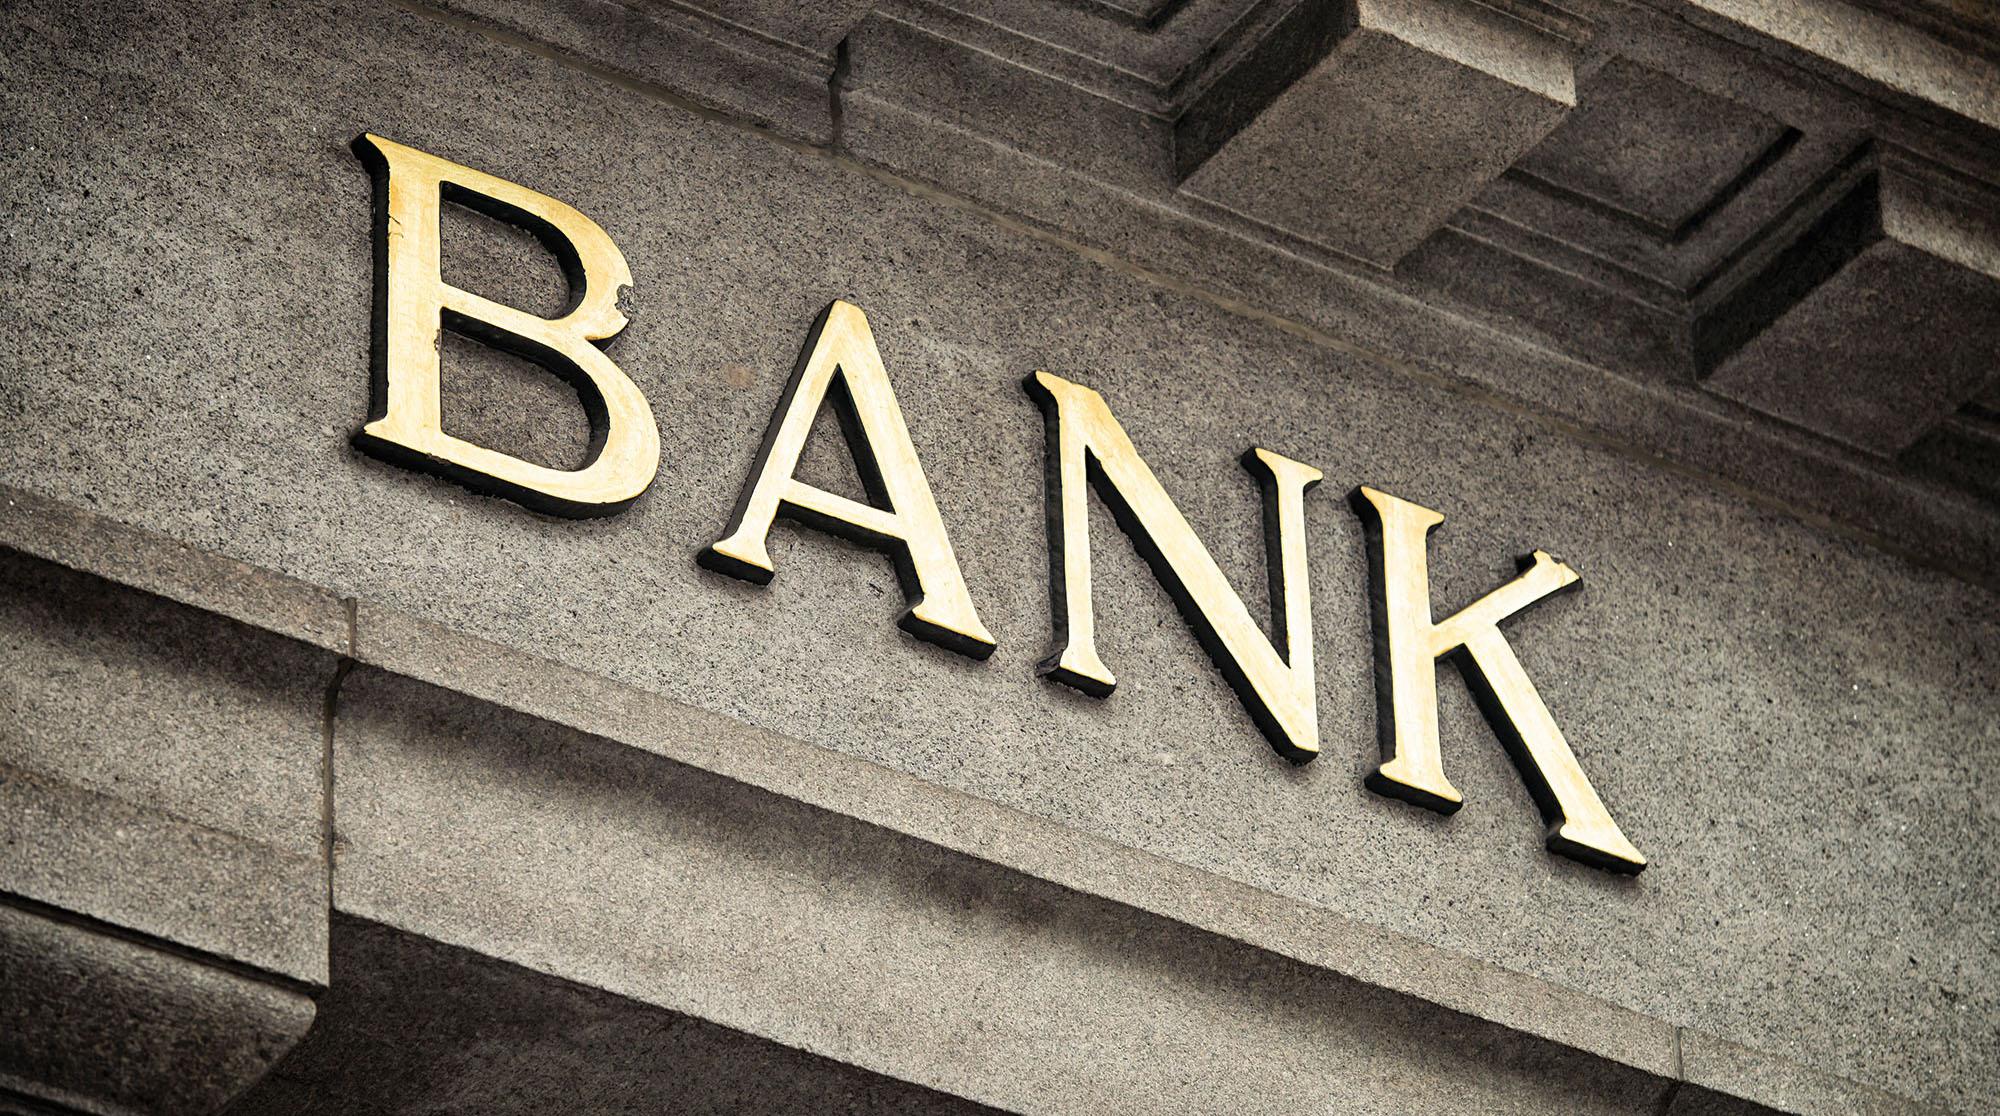 view-source:https://i1.wp.com/unfollow.com.gr/wp-content/uploads/2015/12/Bank-Sign-Building.jpg